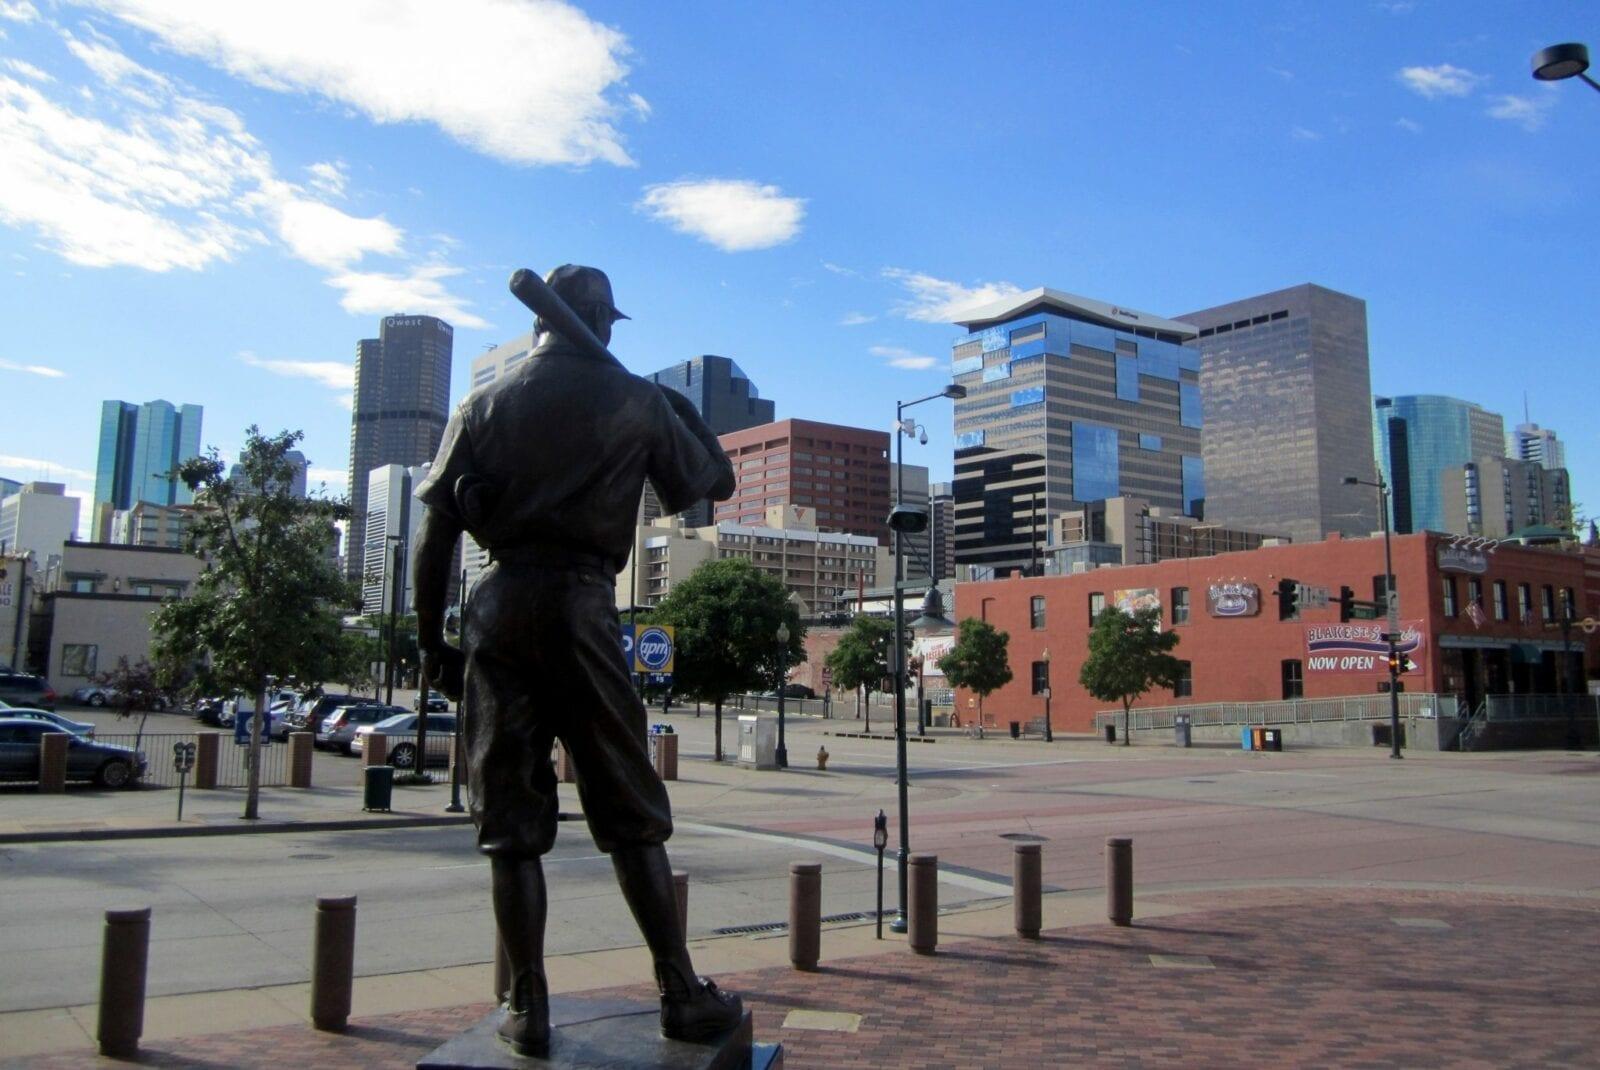 Downtown - LoDo, Denver